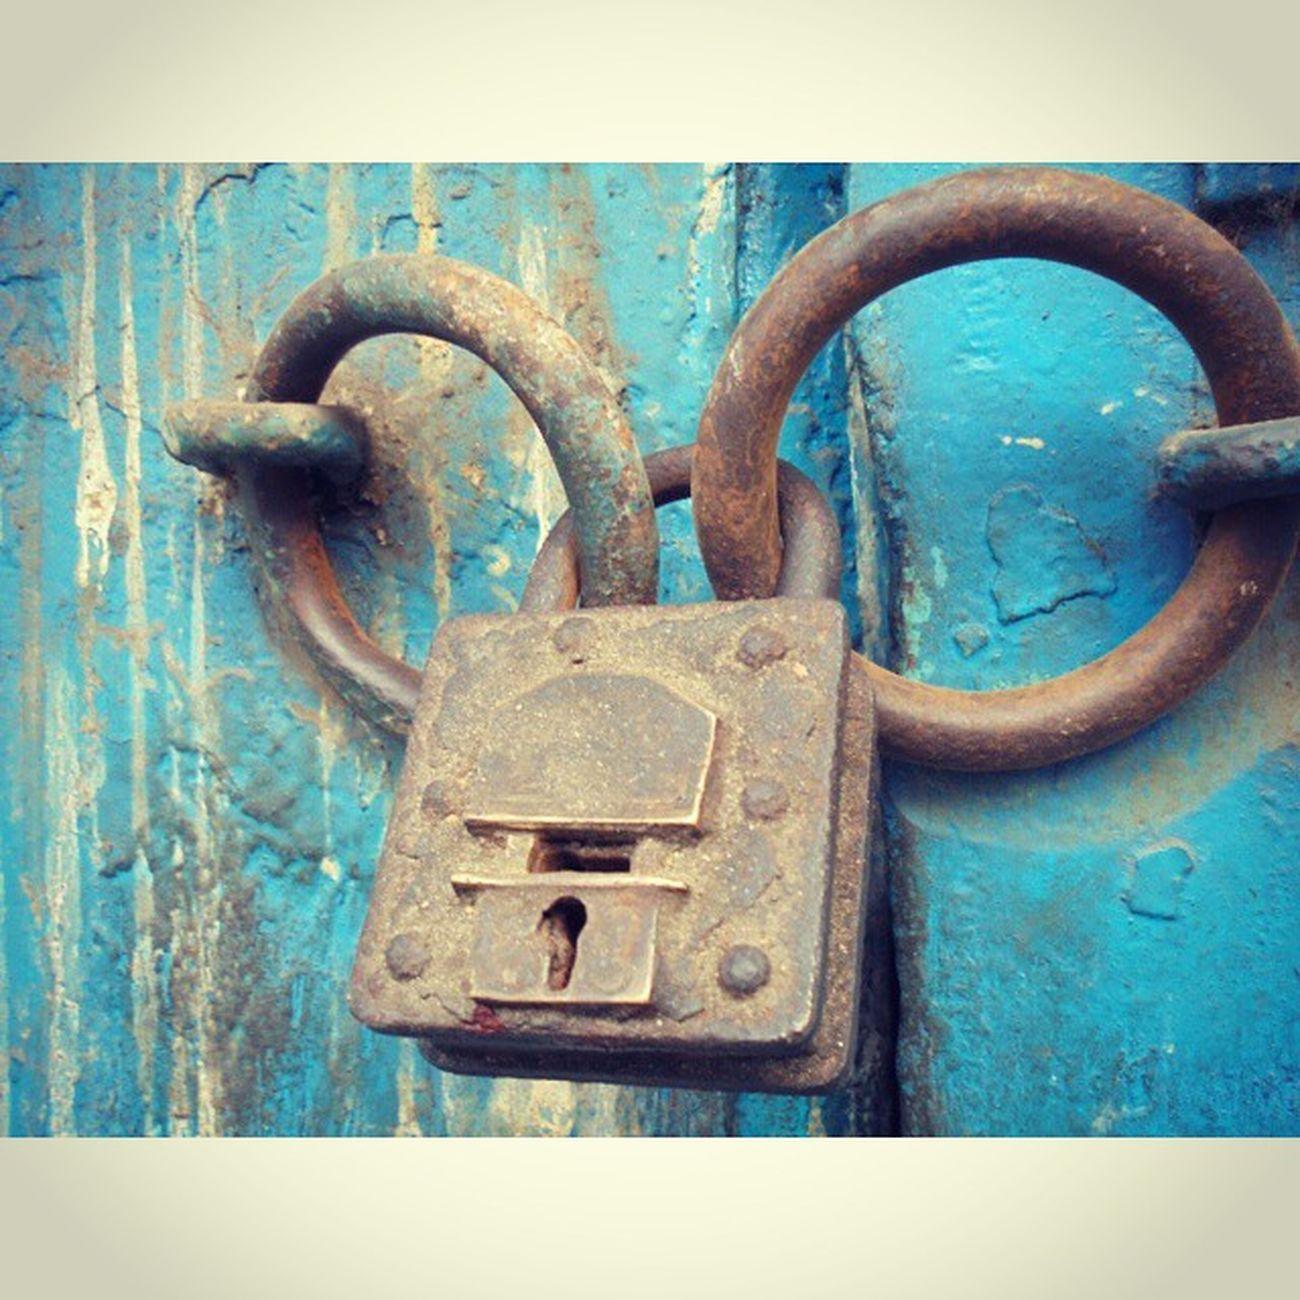 Double lock = Double Security !! Shot during KolkataInstameet , Theme Doors, Locks and Windows Wwim11 Wwimkol11 LocksOfCalcutta Kolinstameet _cic _soi Streetphotogrphy Streetsofkolkata Instagram Instameet Igramming_india Oyeitsindia Calcuttacacophony Mobileclick Iron Rust Smartphone_photography Sony_xperia Oldcalcutta Northkolkata Whywealllovecalcutta